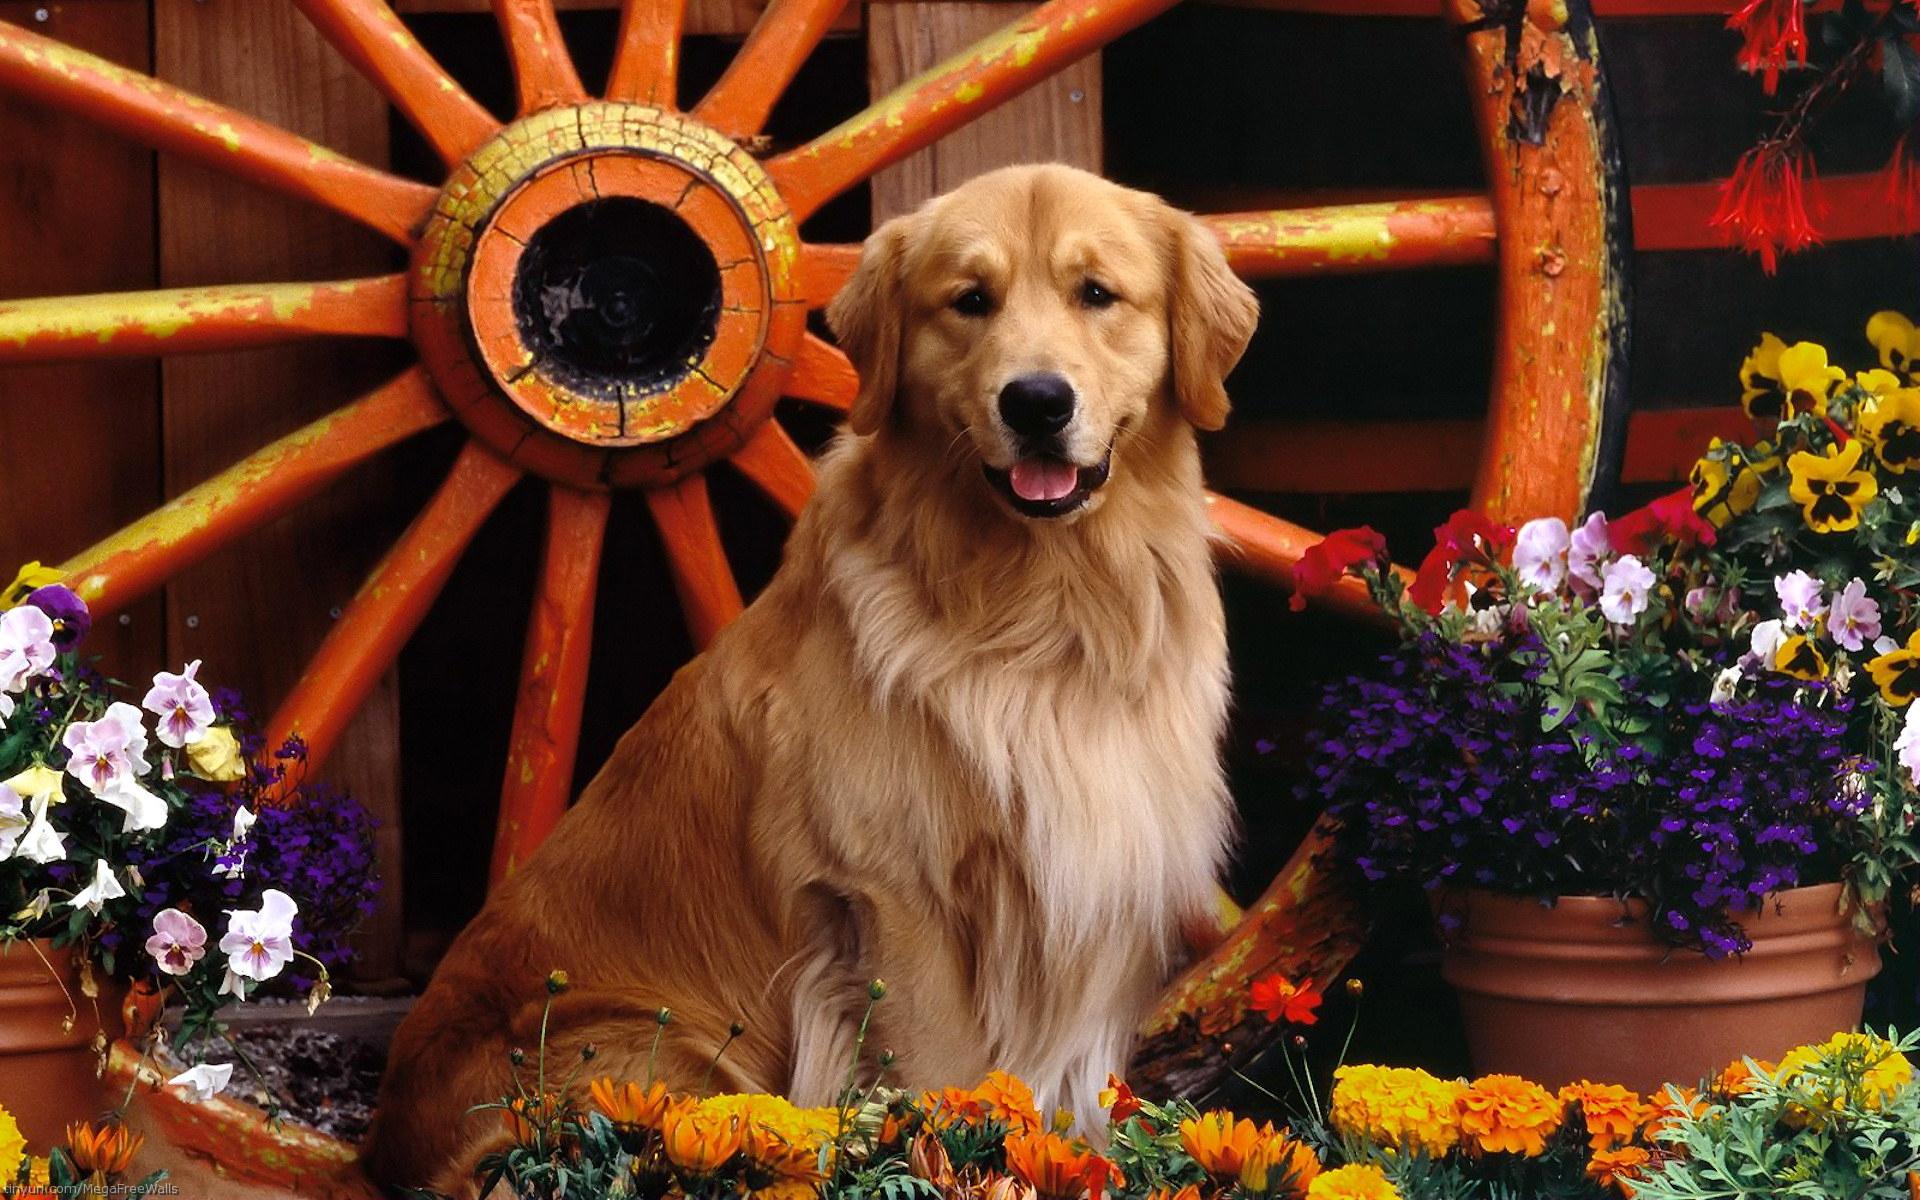 Animal - Golden Retriever  Dog Flower Retriever Animal Wallpaper